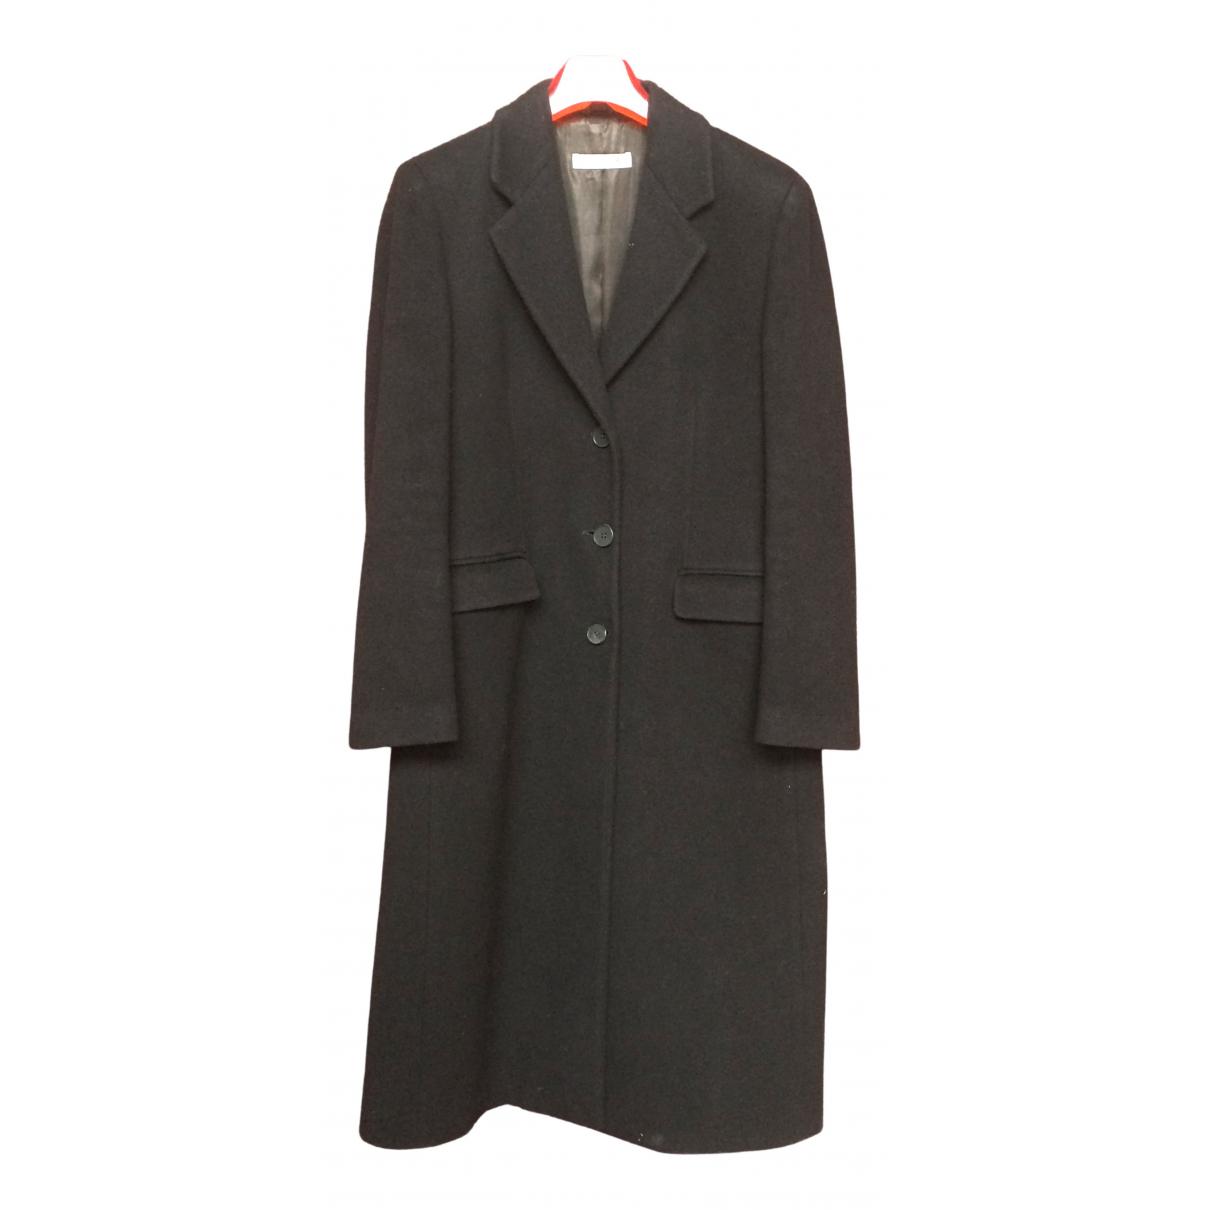 Emporio Armani \N Jacke in  Schwarz Wolle